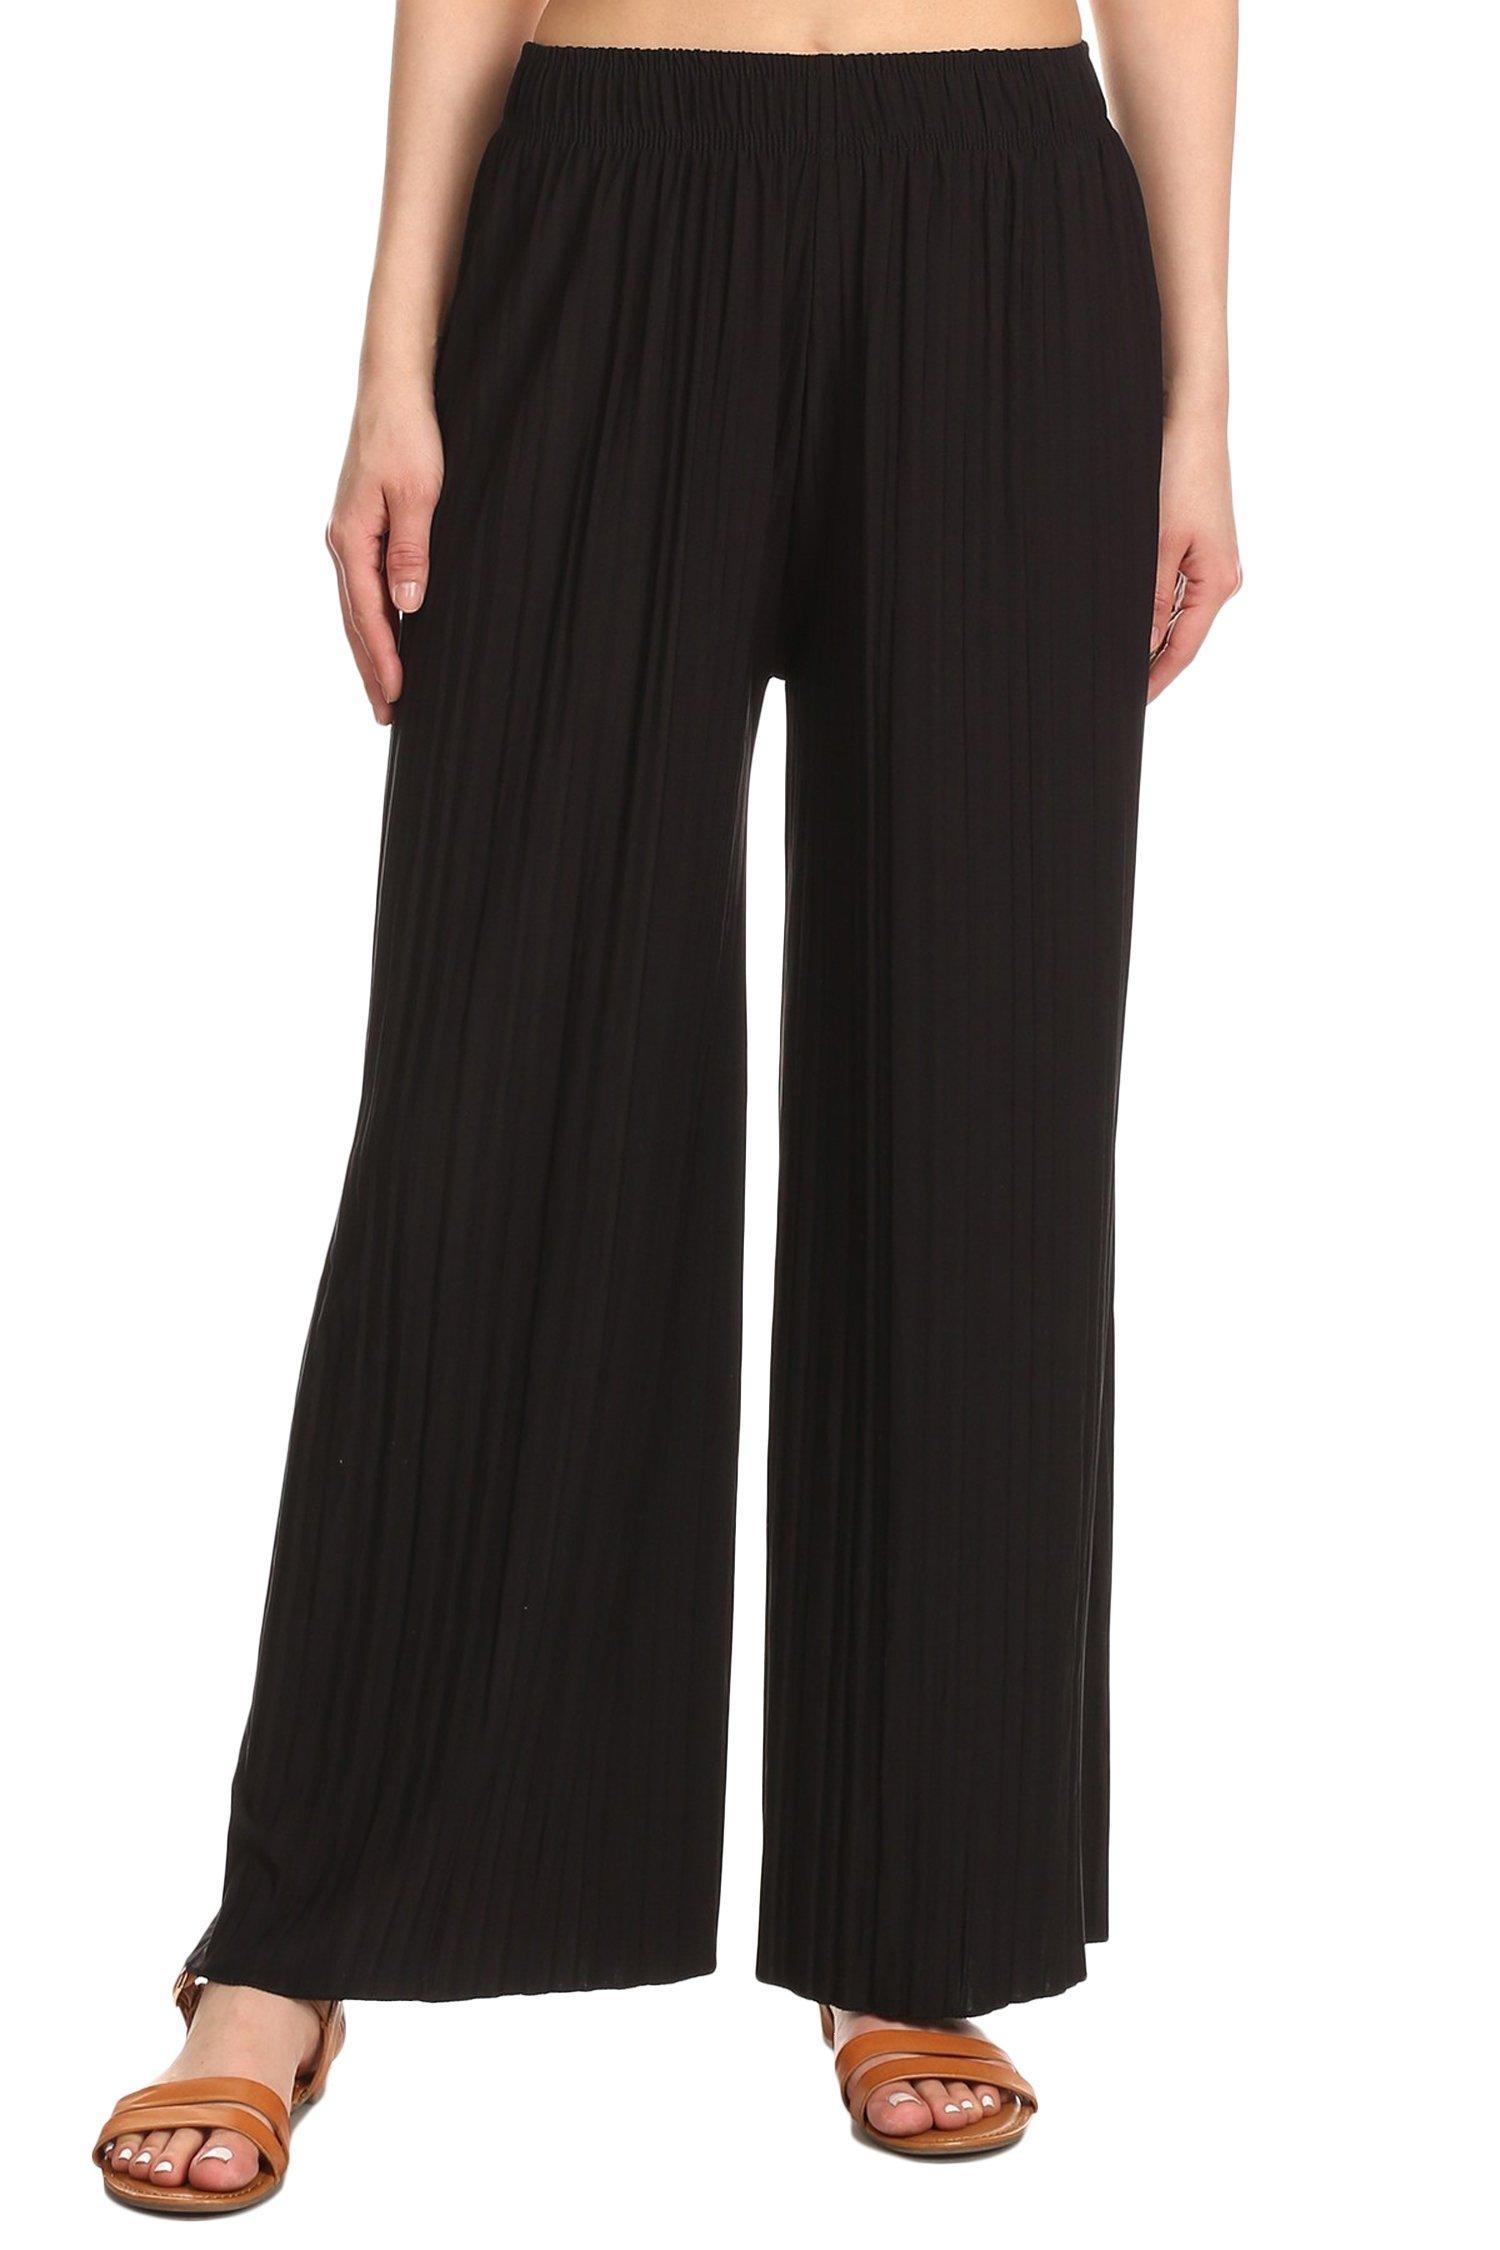 TL Women's Versatile Comfy Wide Leg Long Maternity Palazzo Gaucho Lounge Pants 014_Black OS